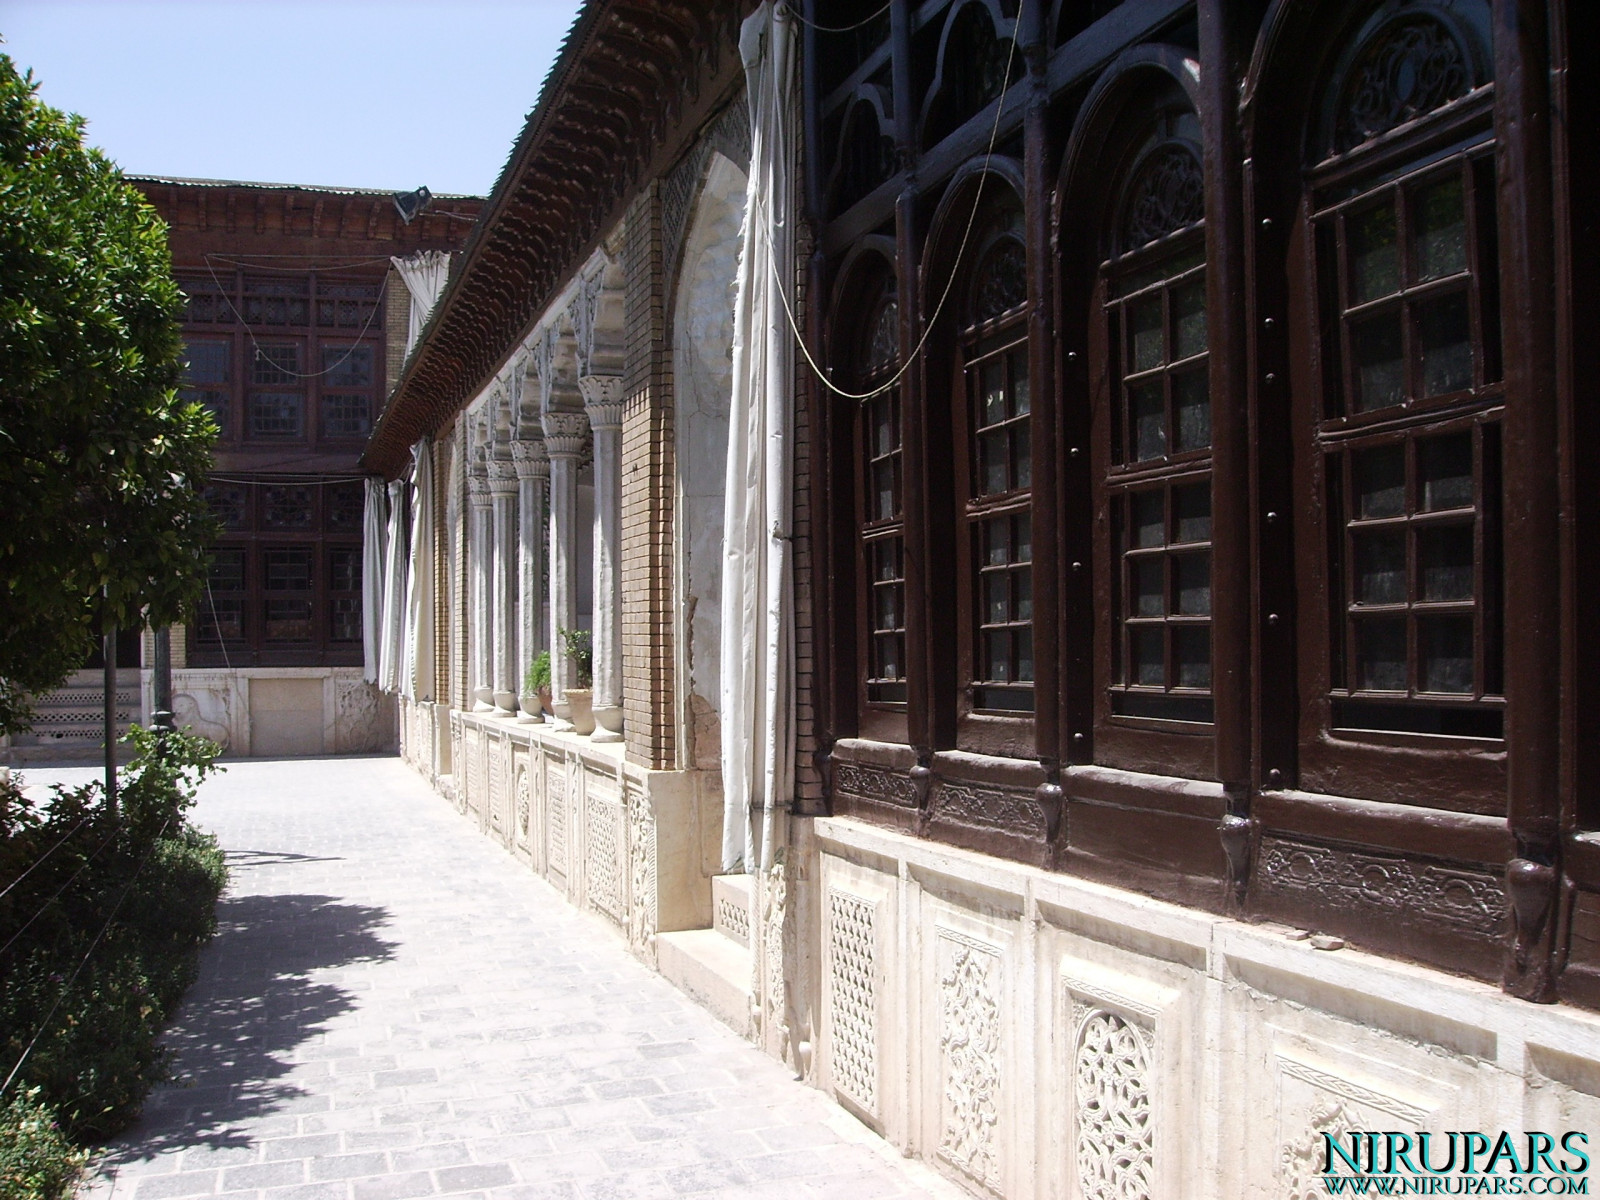 Pars History Museum